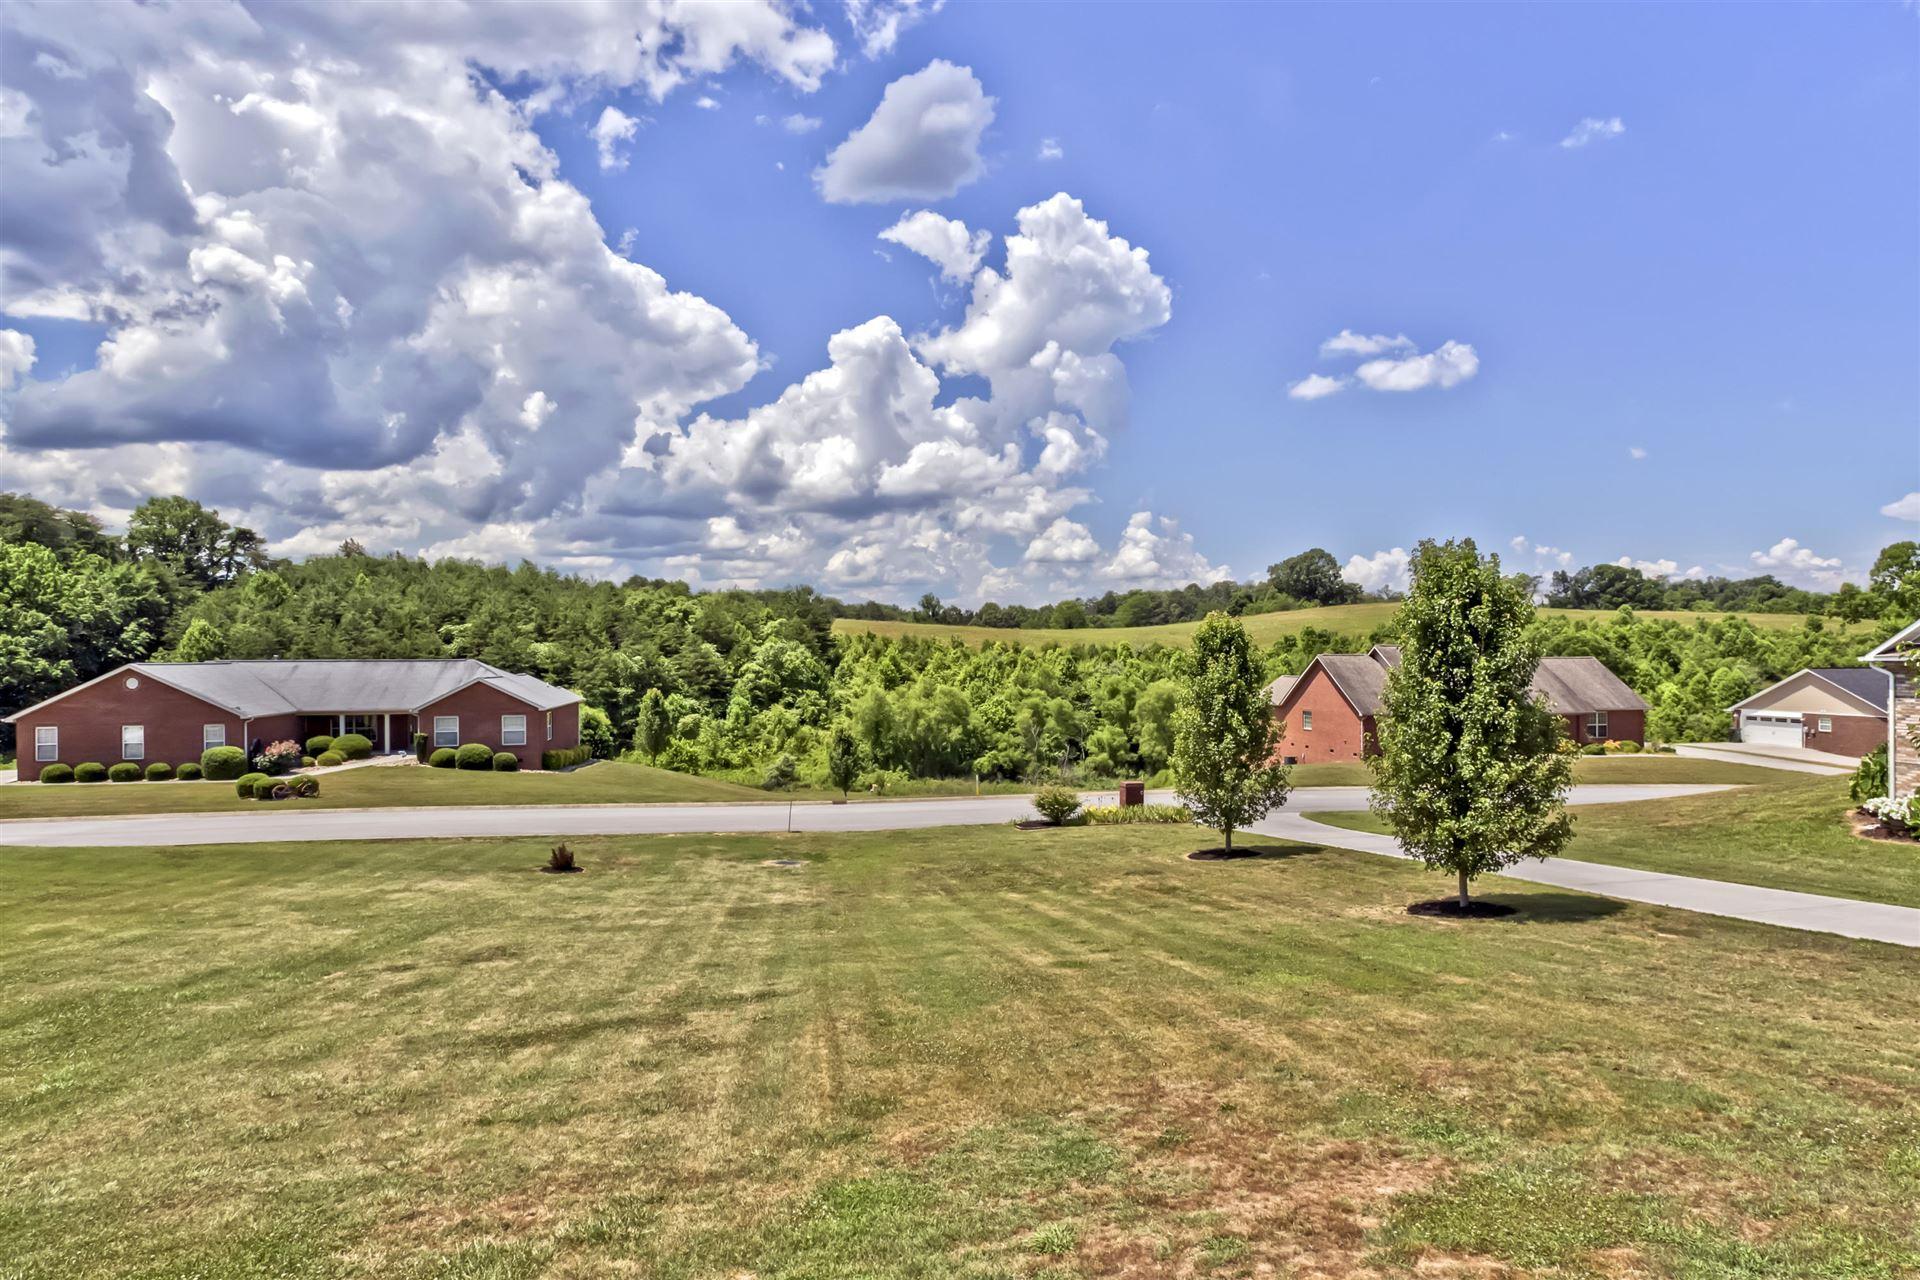 Photo of 1337 Sugarland Circle, Sevierville, TN 37862 (MLS # 1120289)